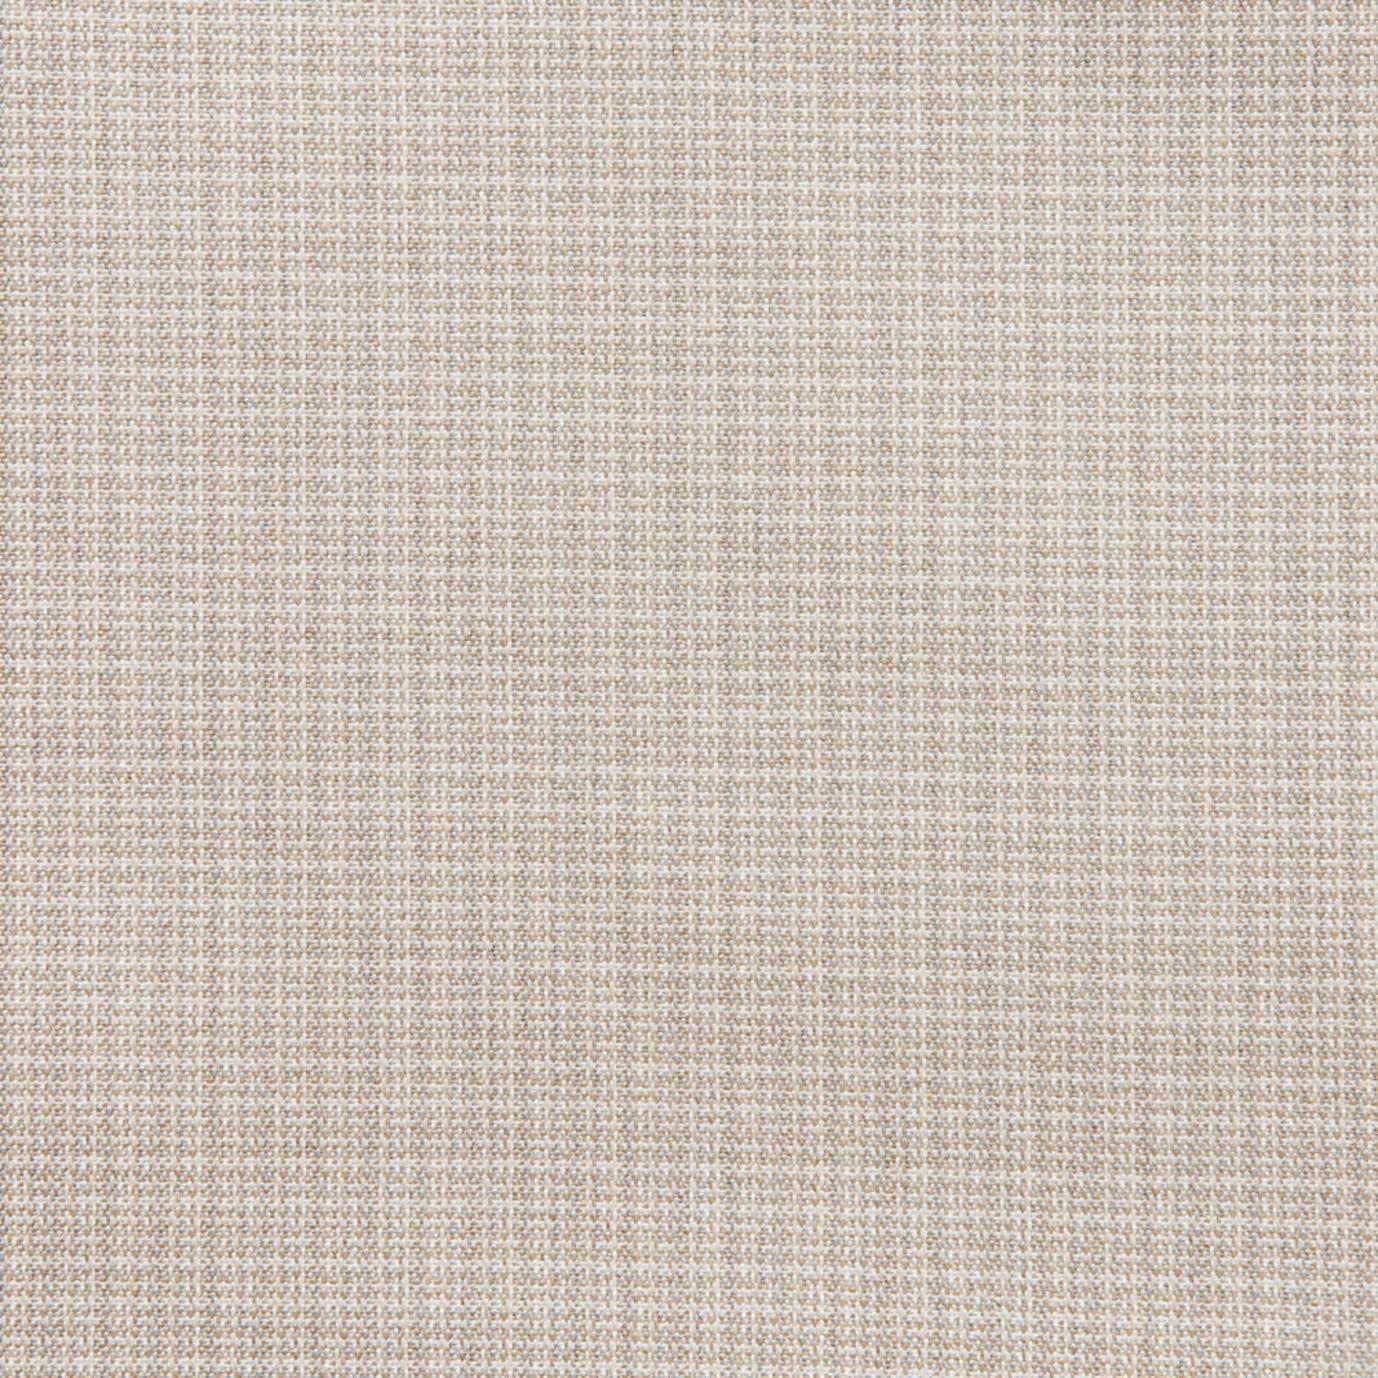 Deco™ Swivel Barstool 2pk - Slate Grey